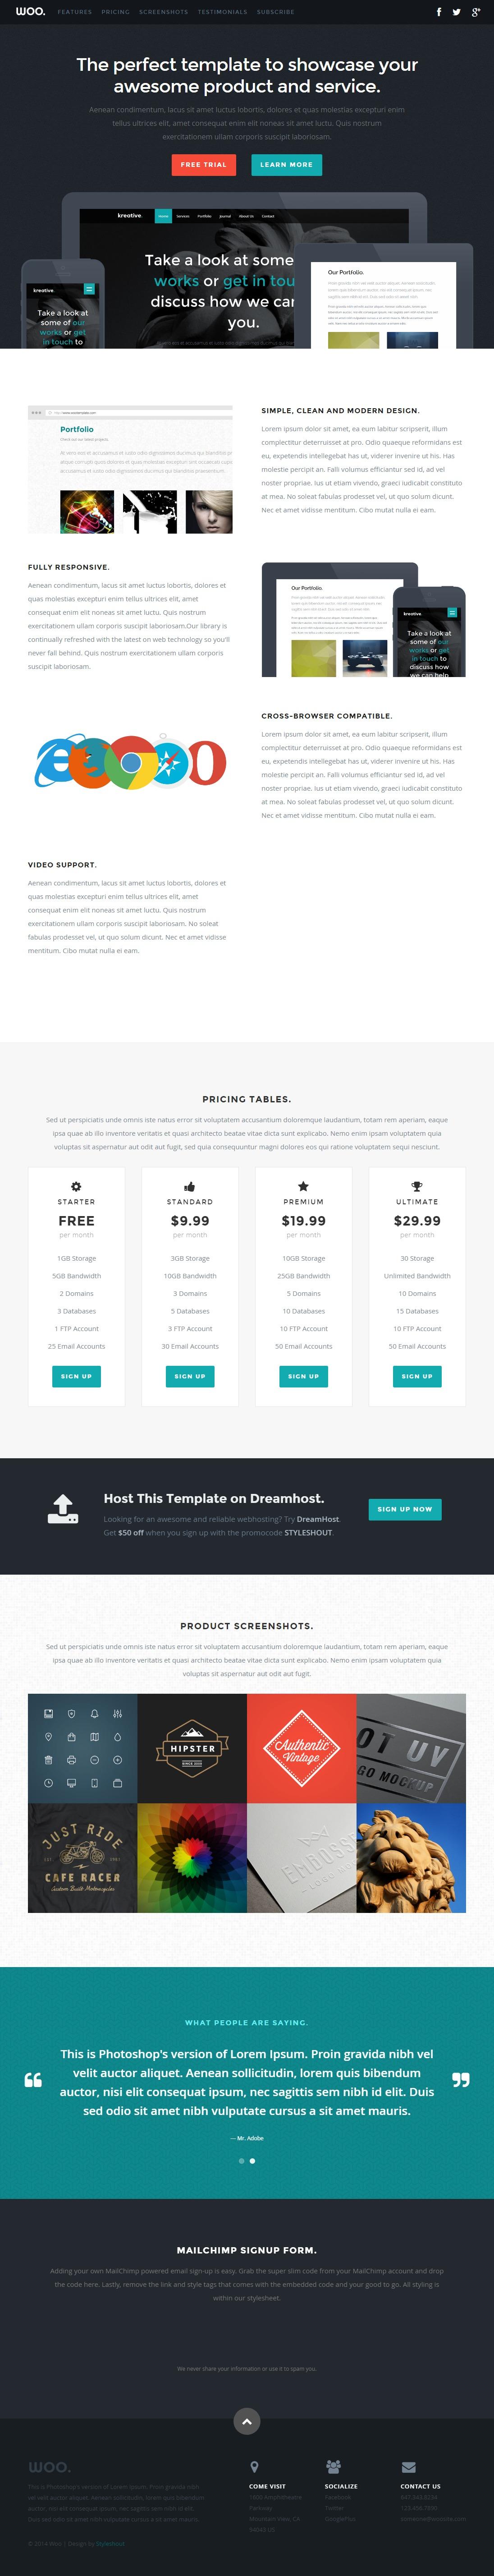 Woo-Free-Responsive-HTML5-CSS3-Template